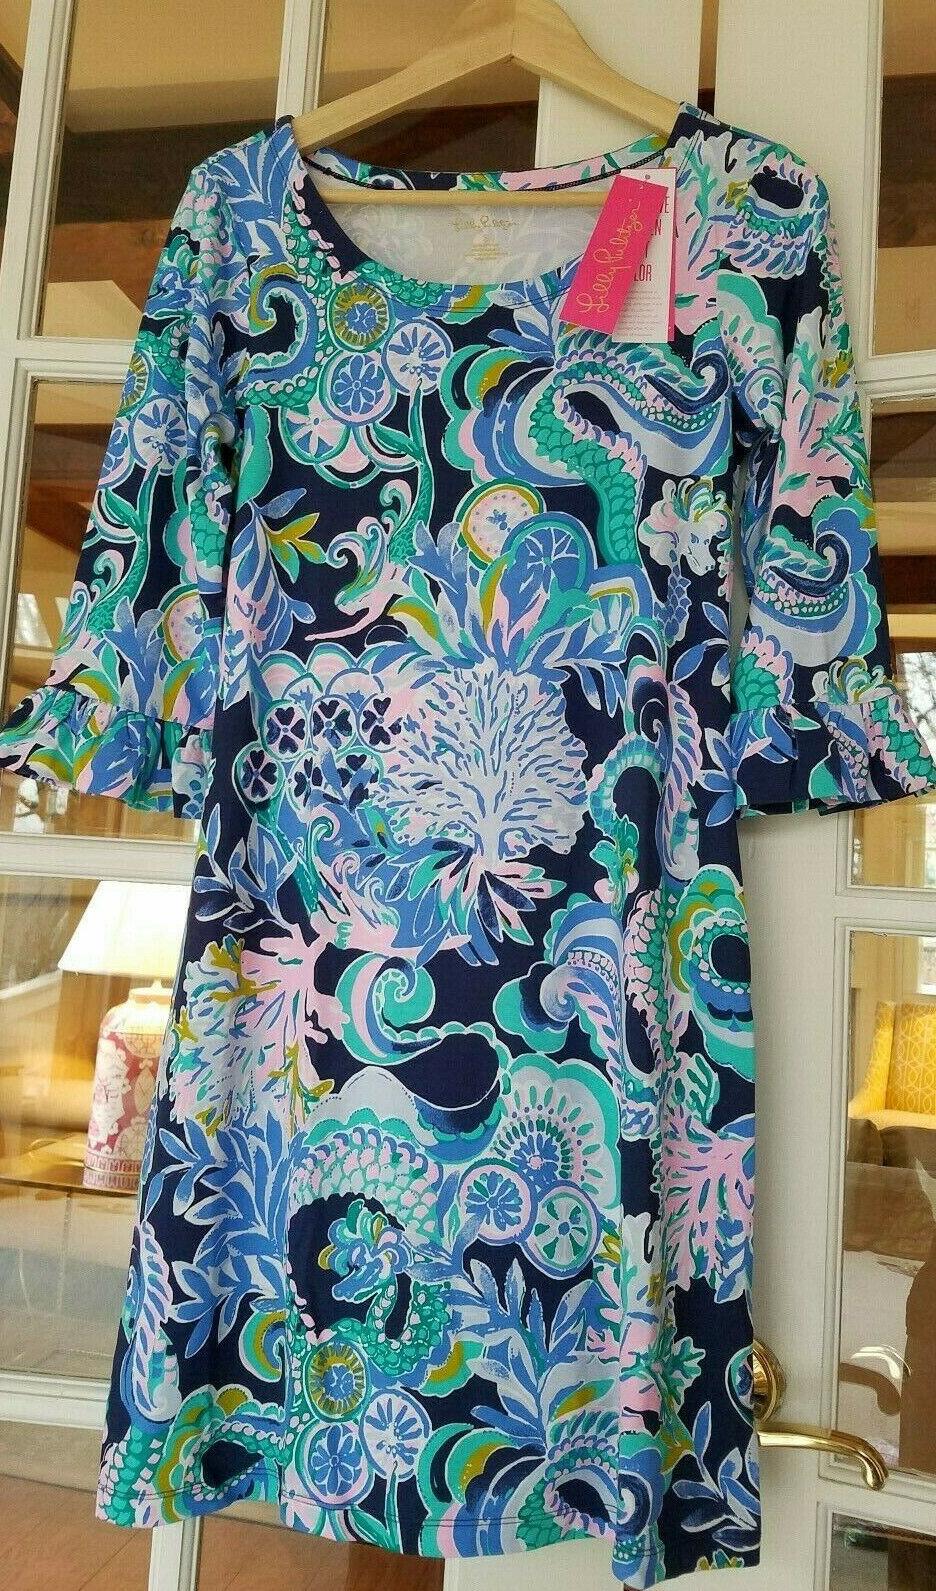 Lilly Pulitzer Sophie Ruffle Dress Sirens and Spirits Bright Blau Marine SMALL 01077